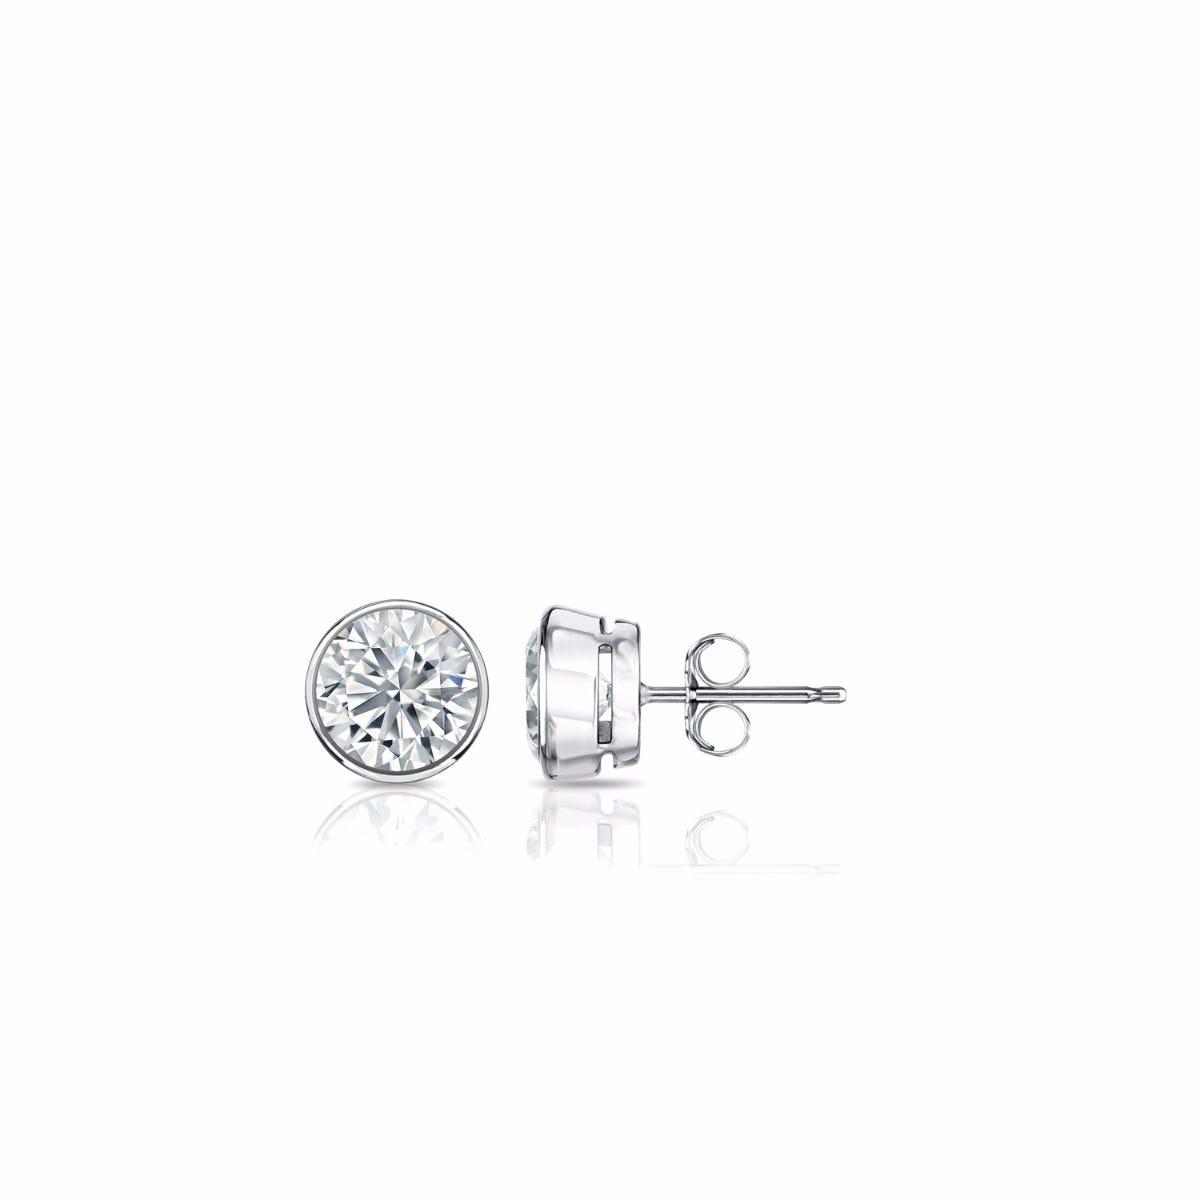 Bezel-Set Round 1/10ctw. Diamond Solitaire Stud Earrings (IJ, I2) in Platinum